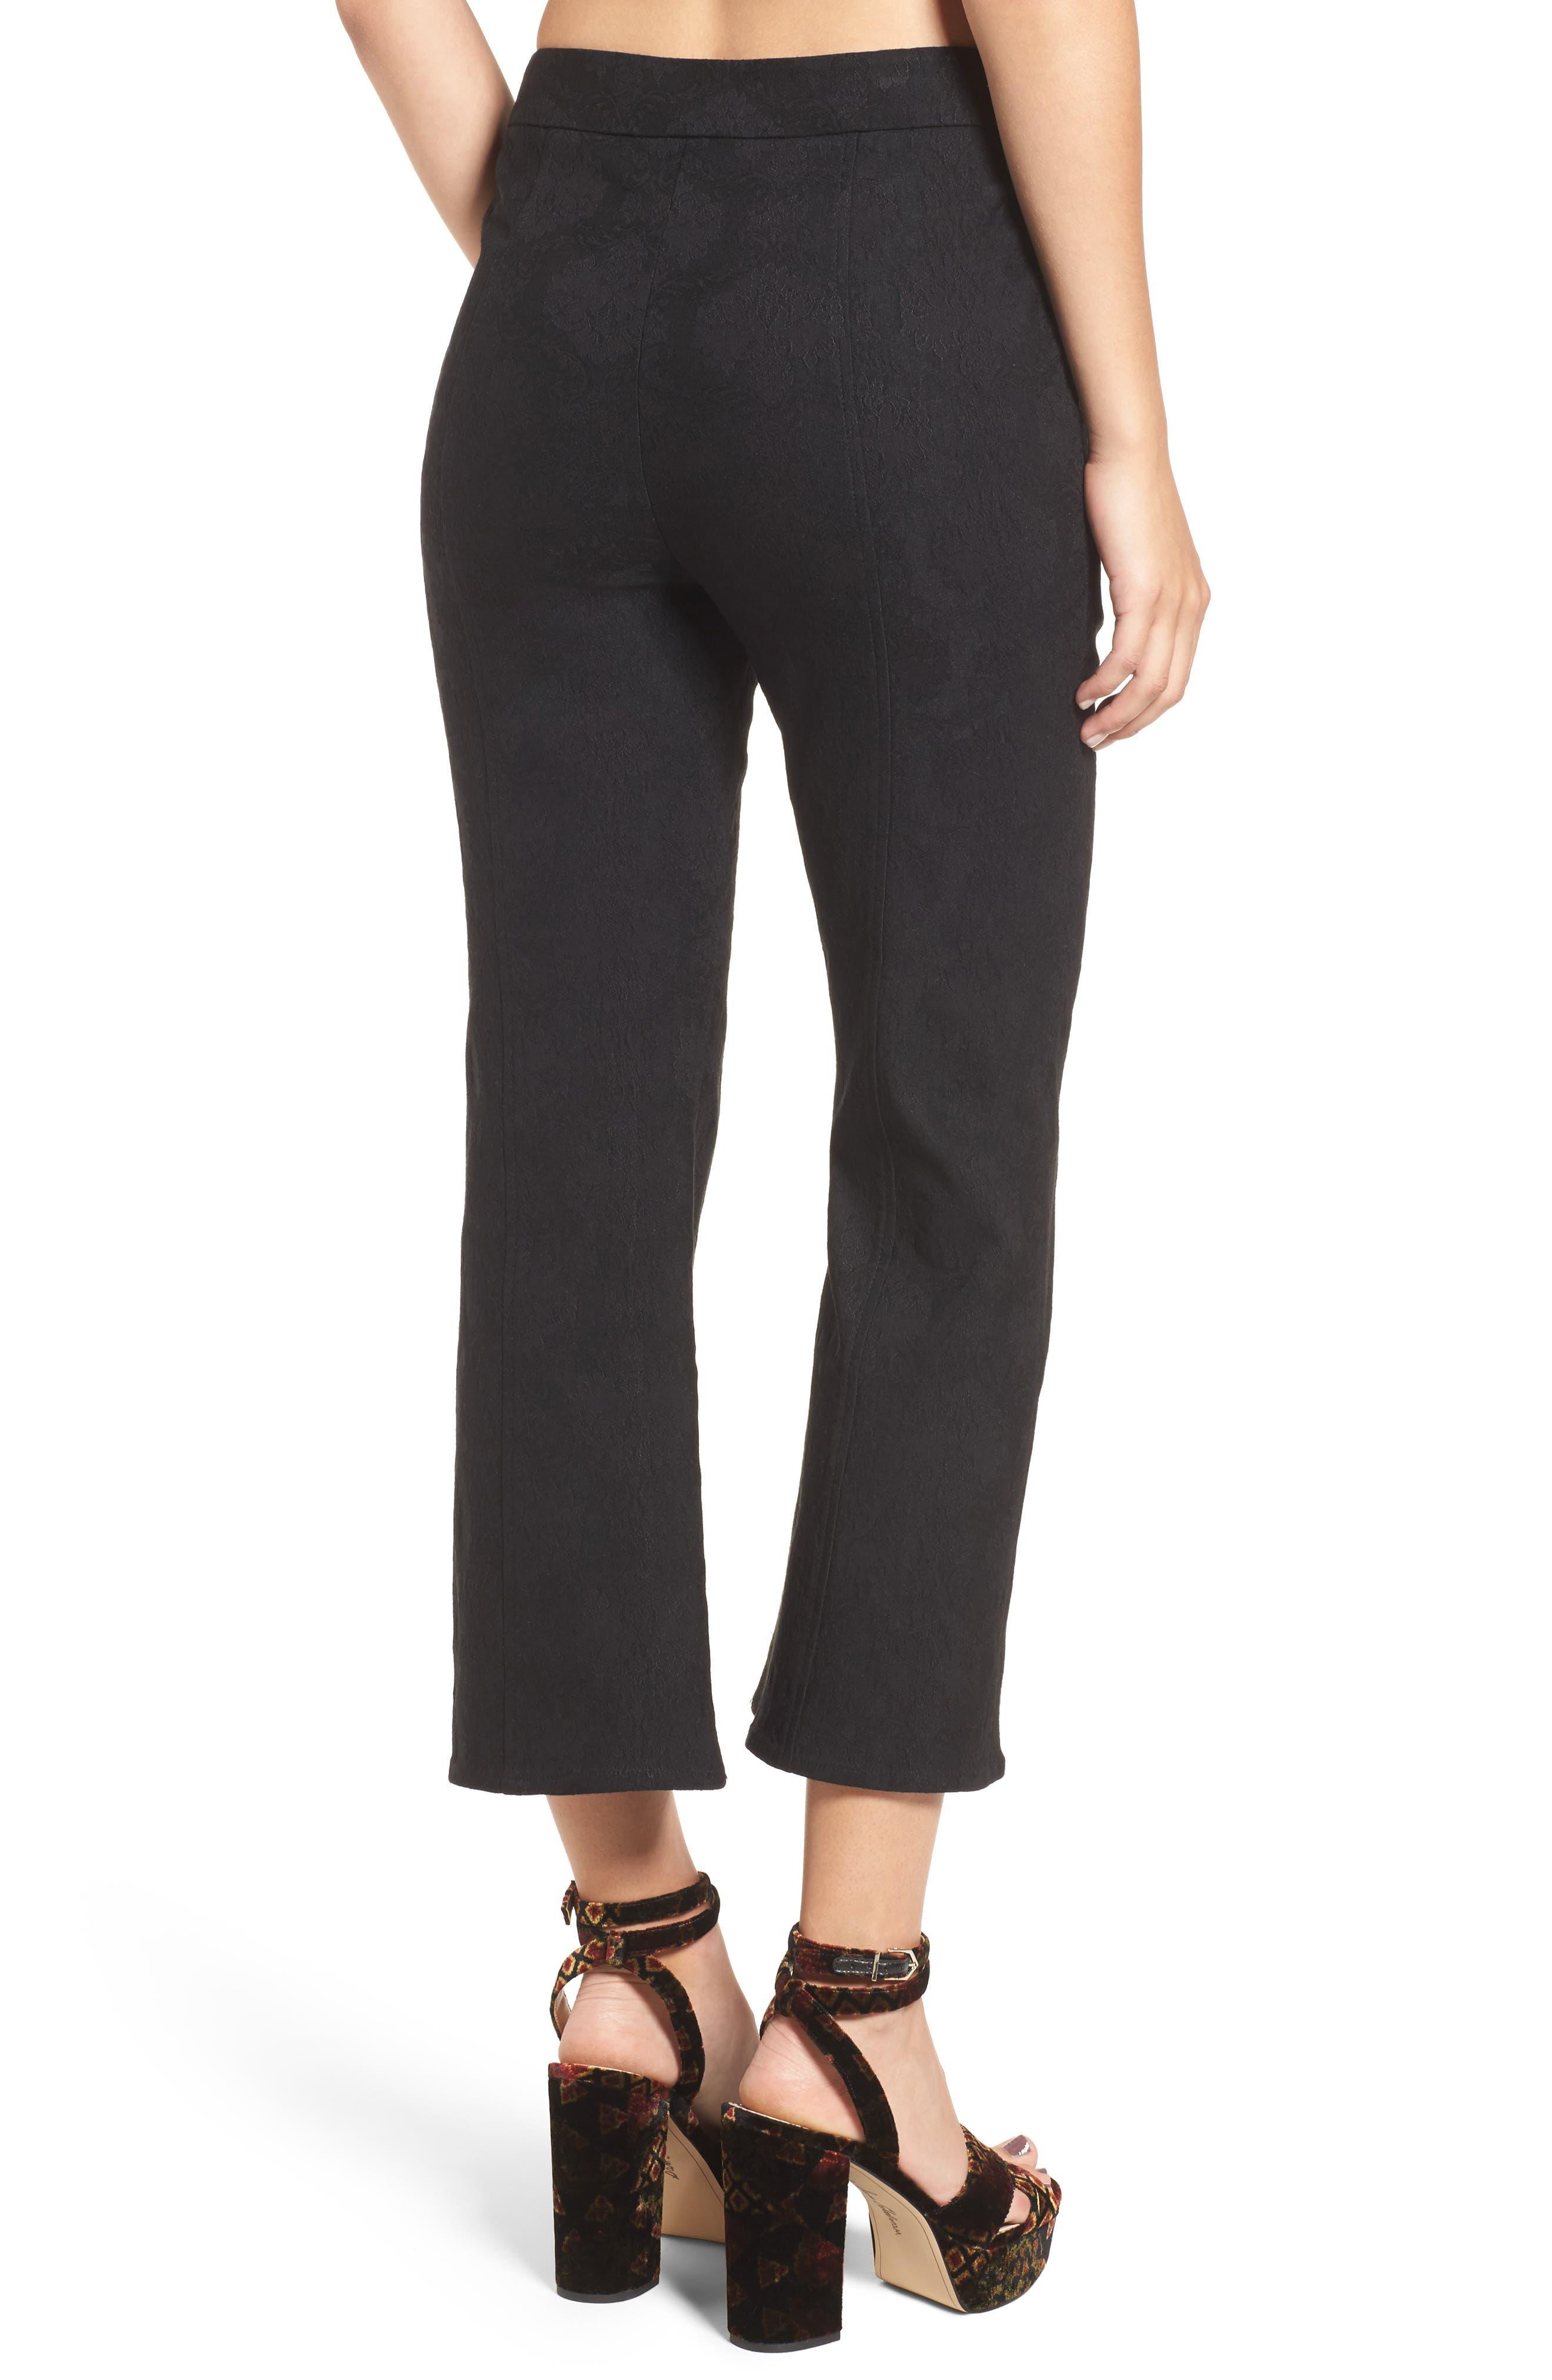 Leigh High Waist Crop Pants,                             Alternate thumbnail 3, color,                             Black